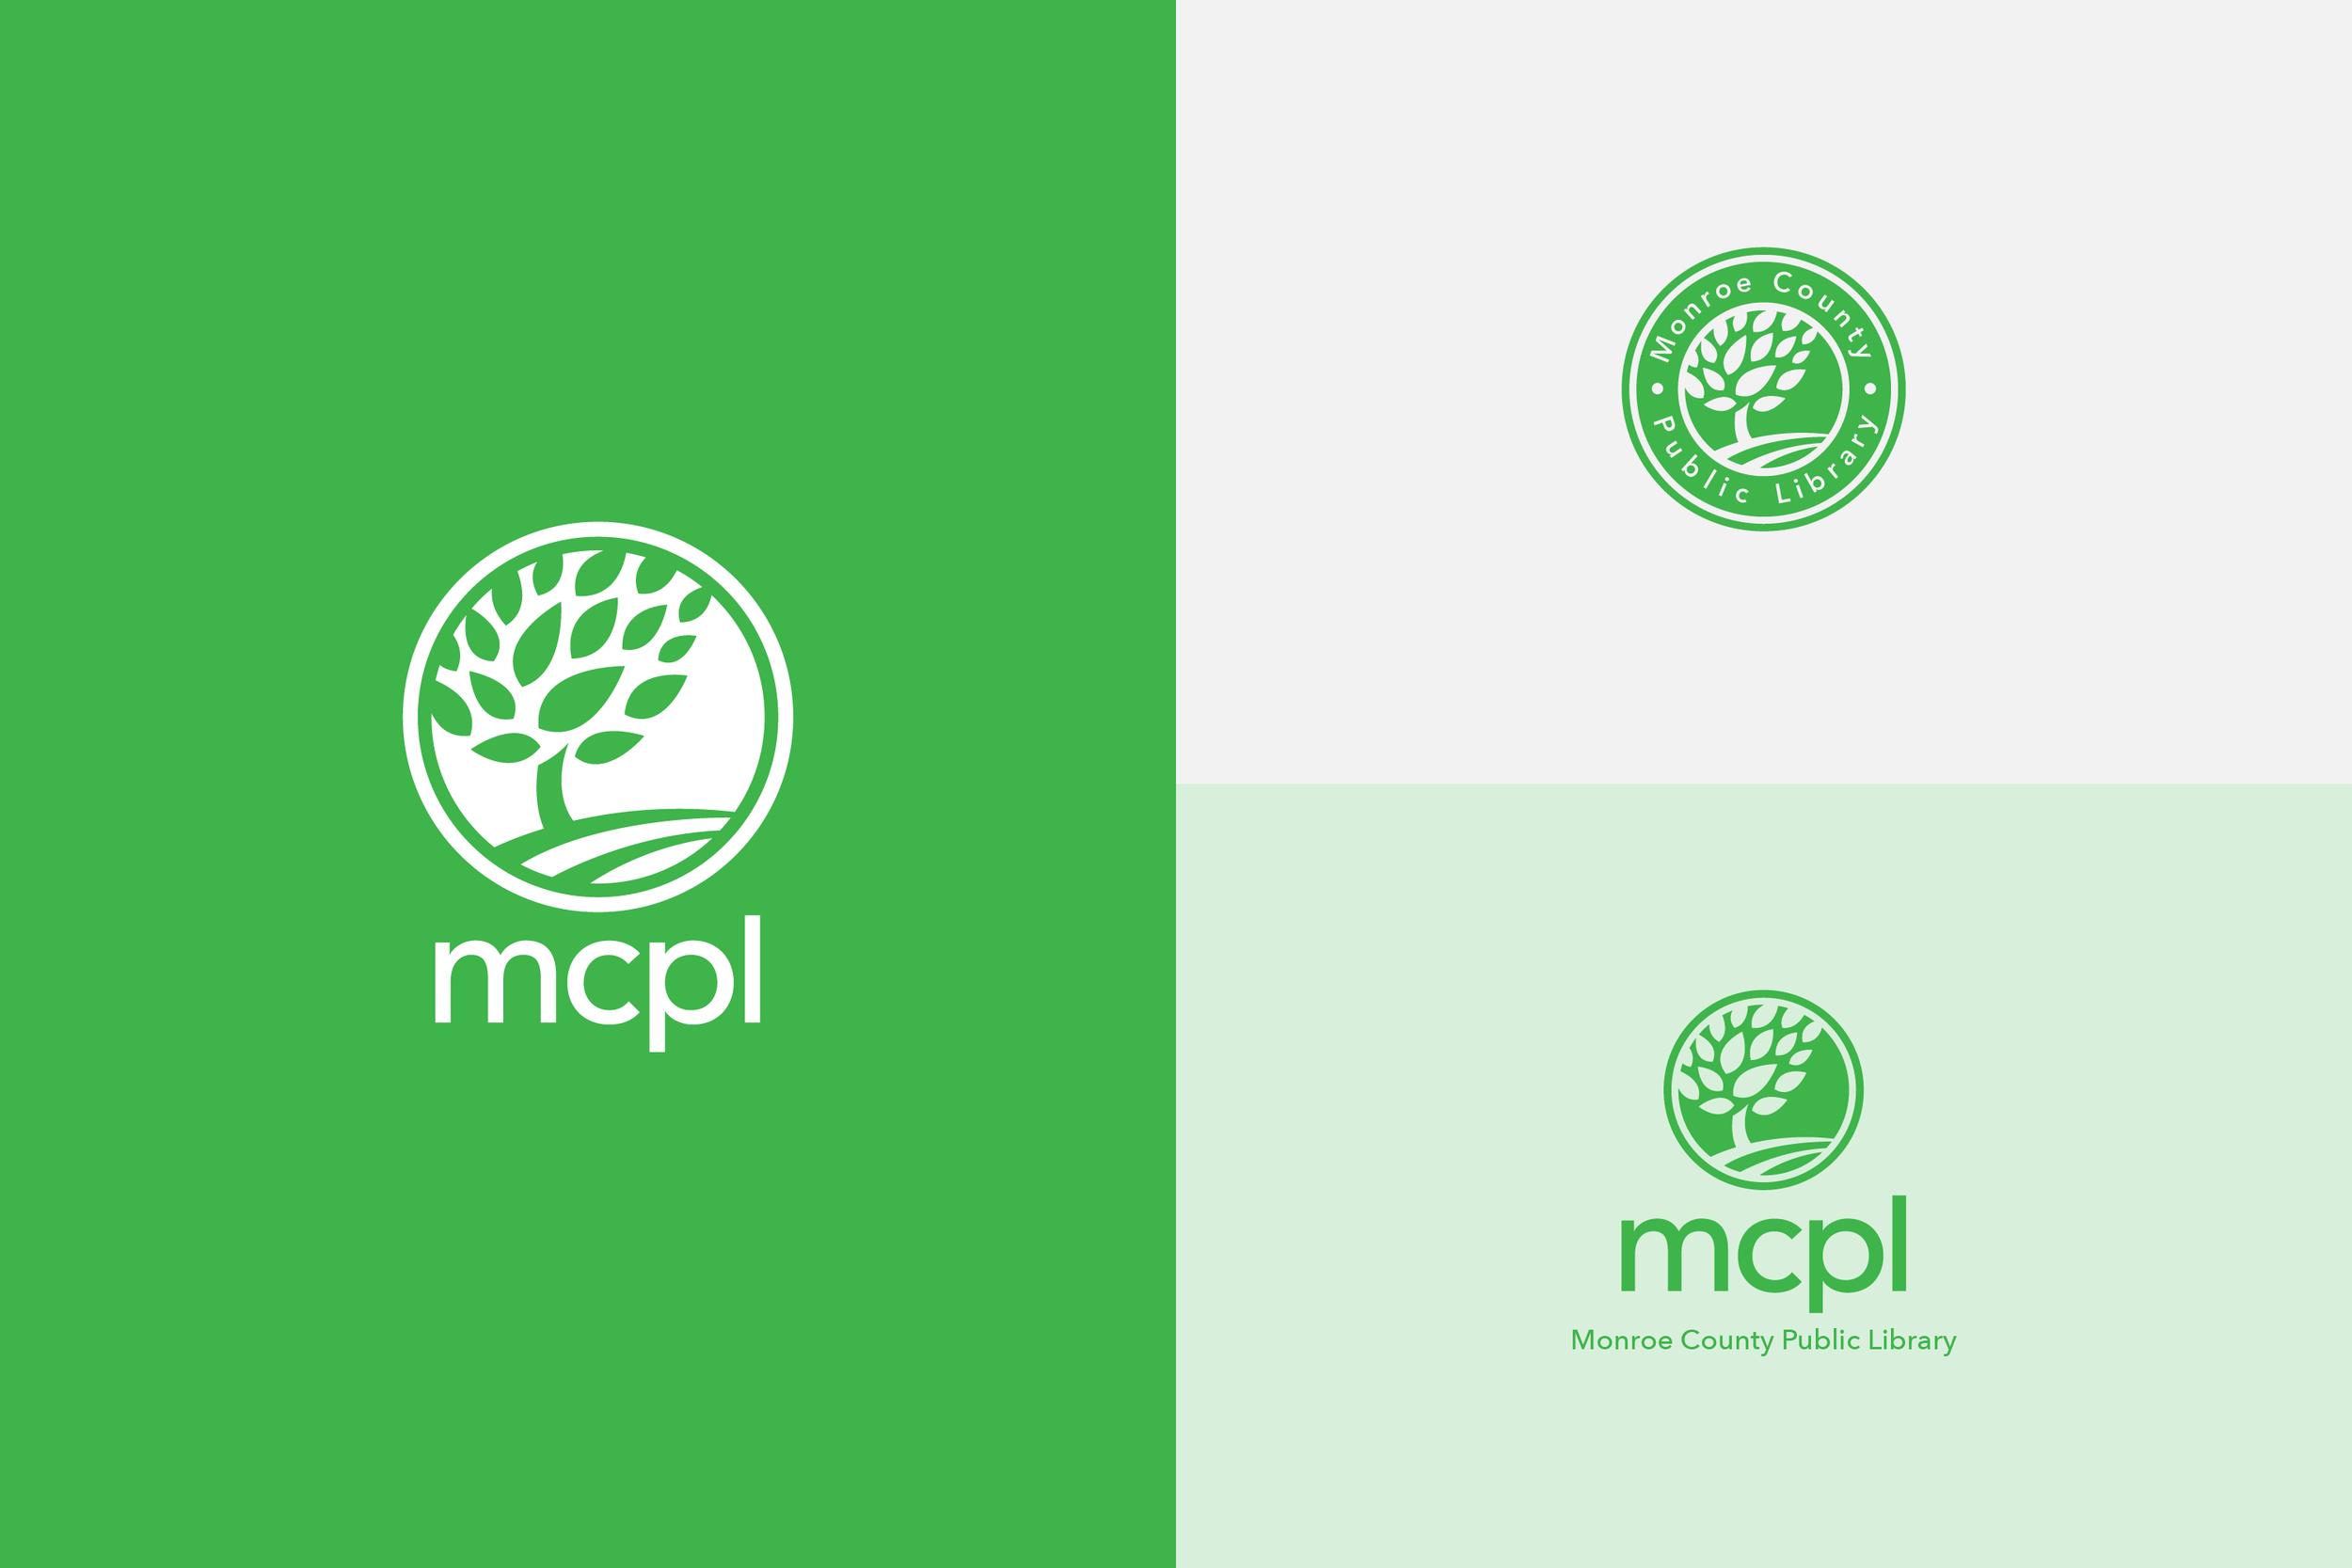 mcpl-composite-1.png